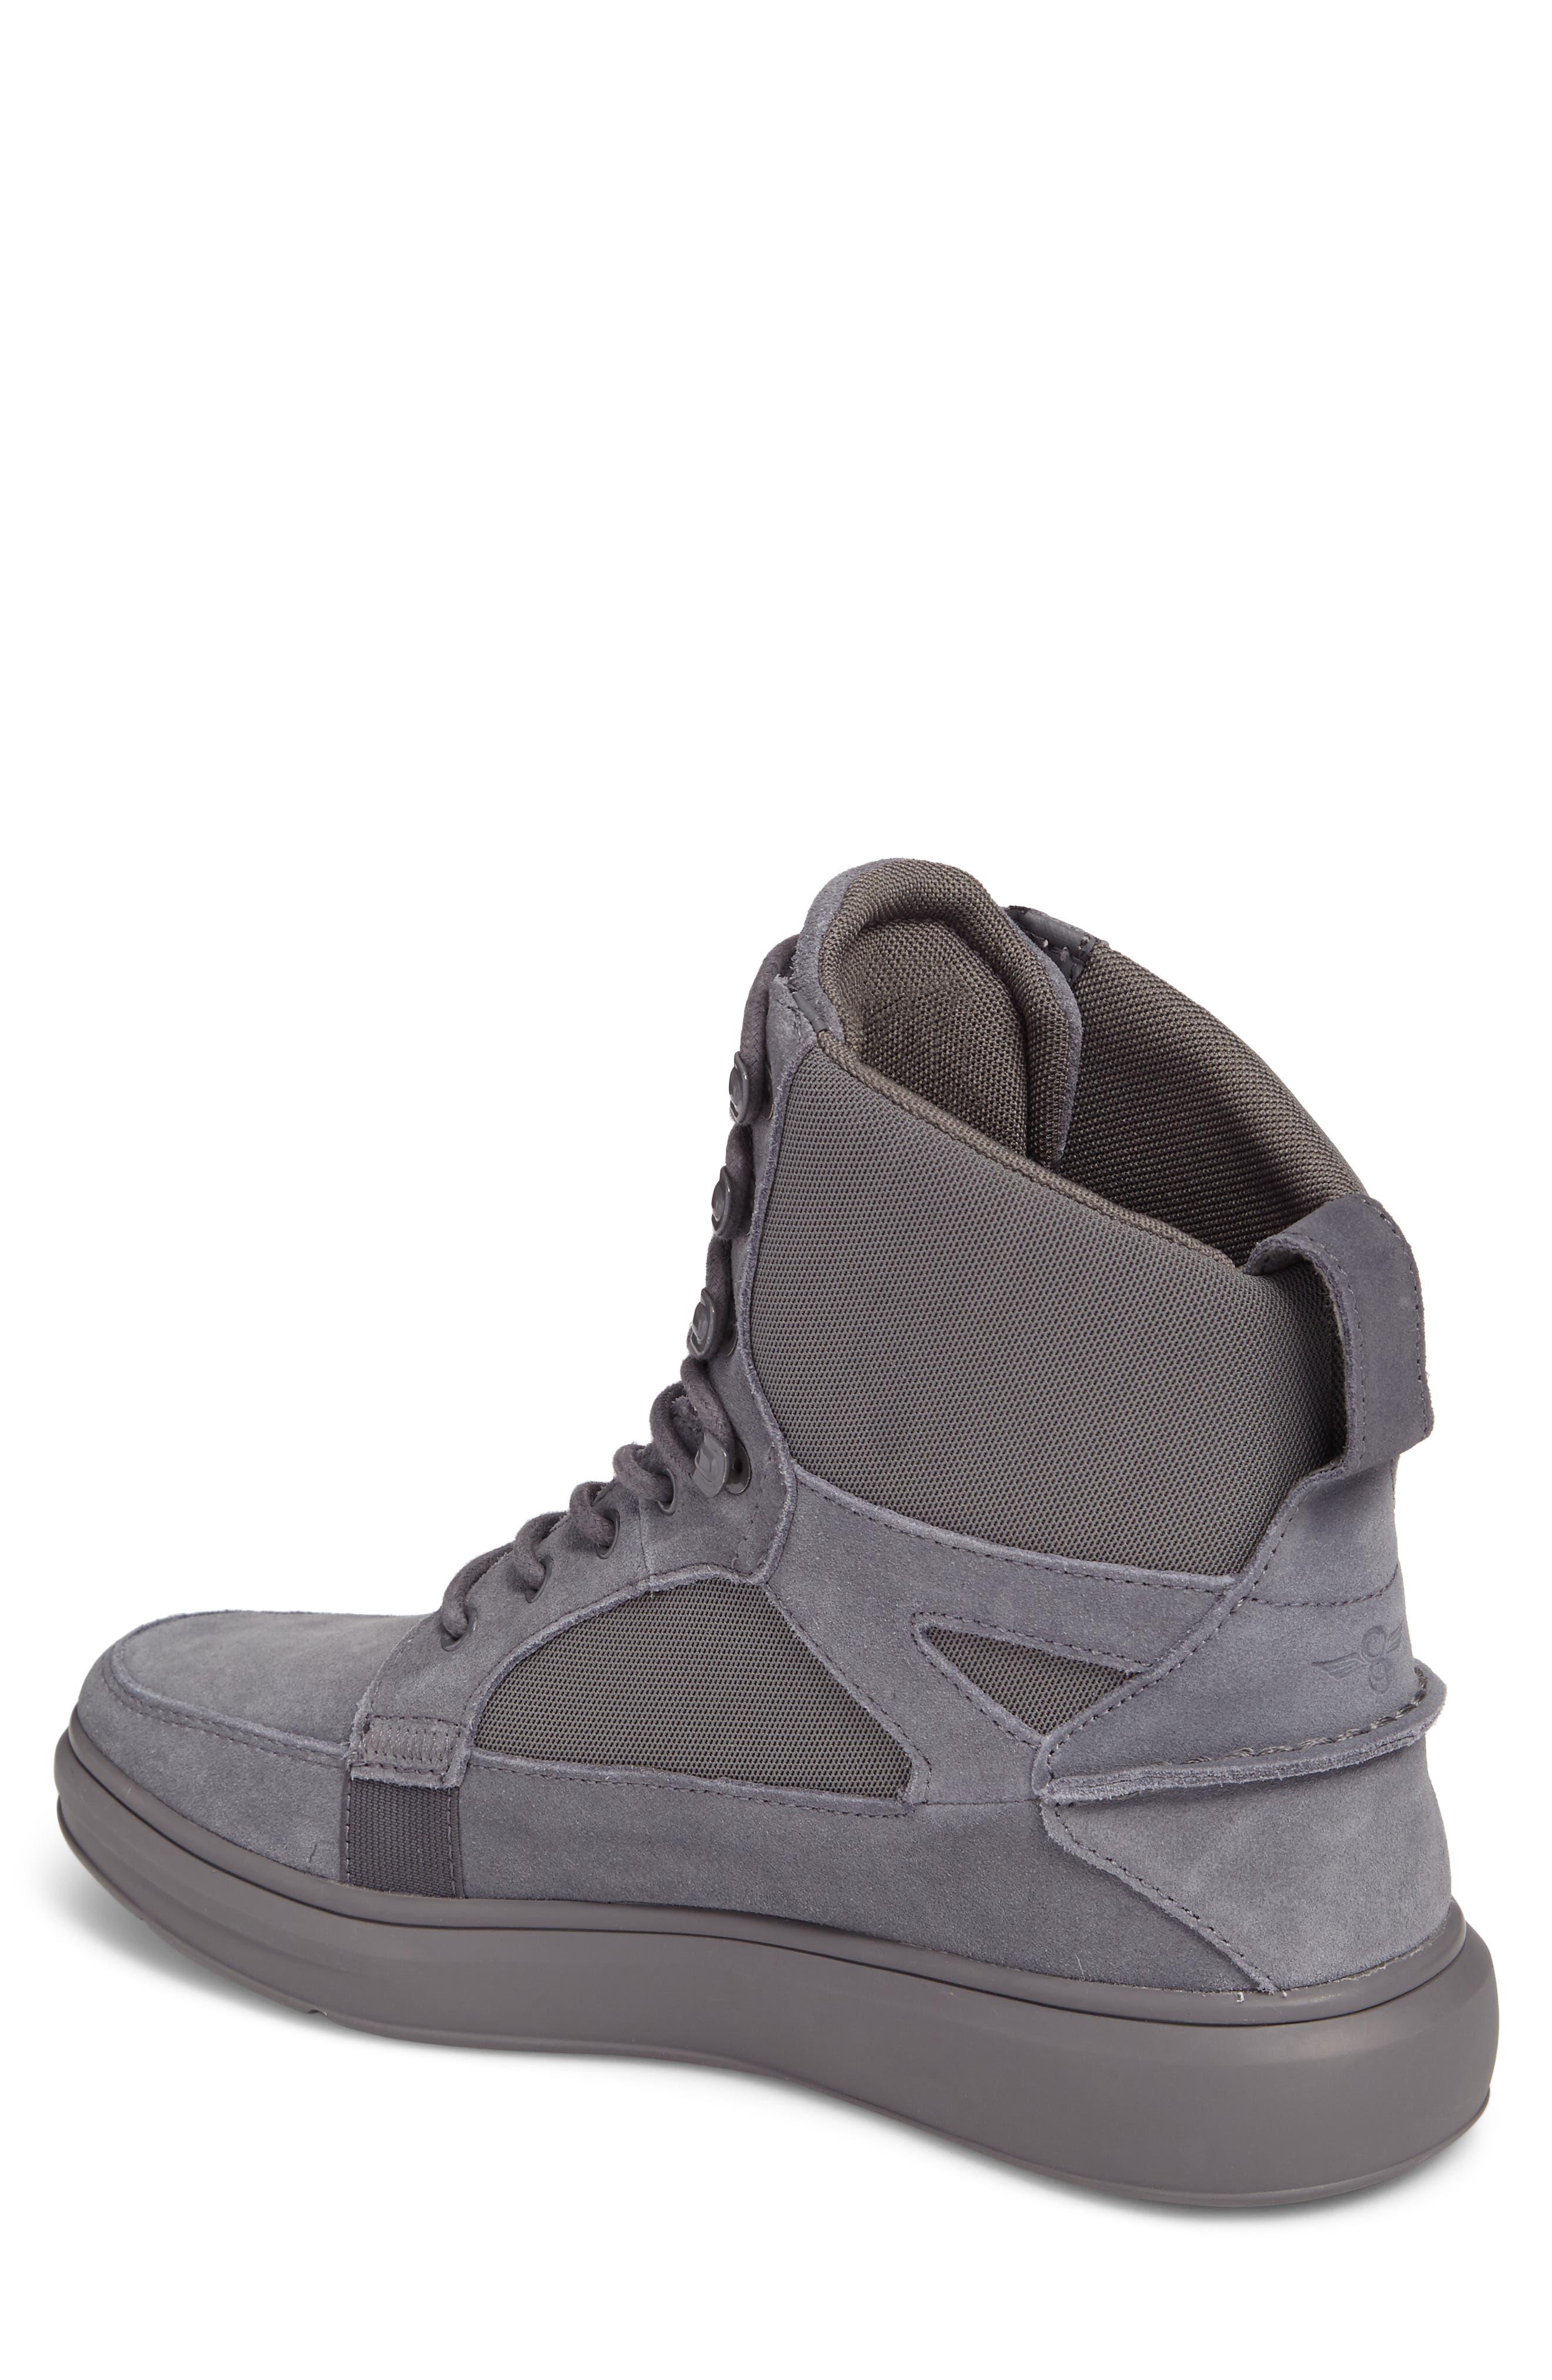 Desimo Sneaker,                             Alternate thumbnail 2, color,                             Smoke Leather